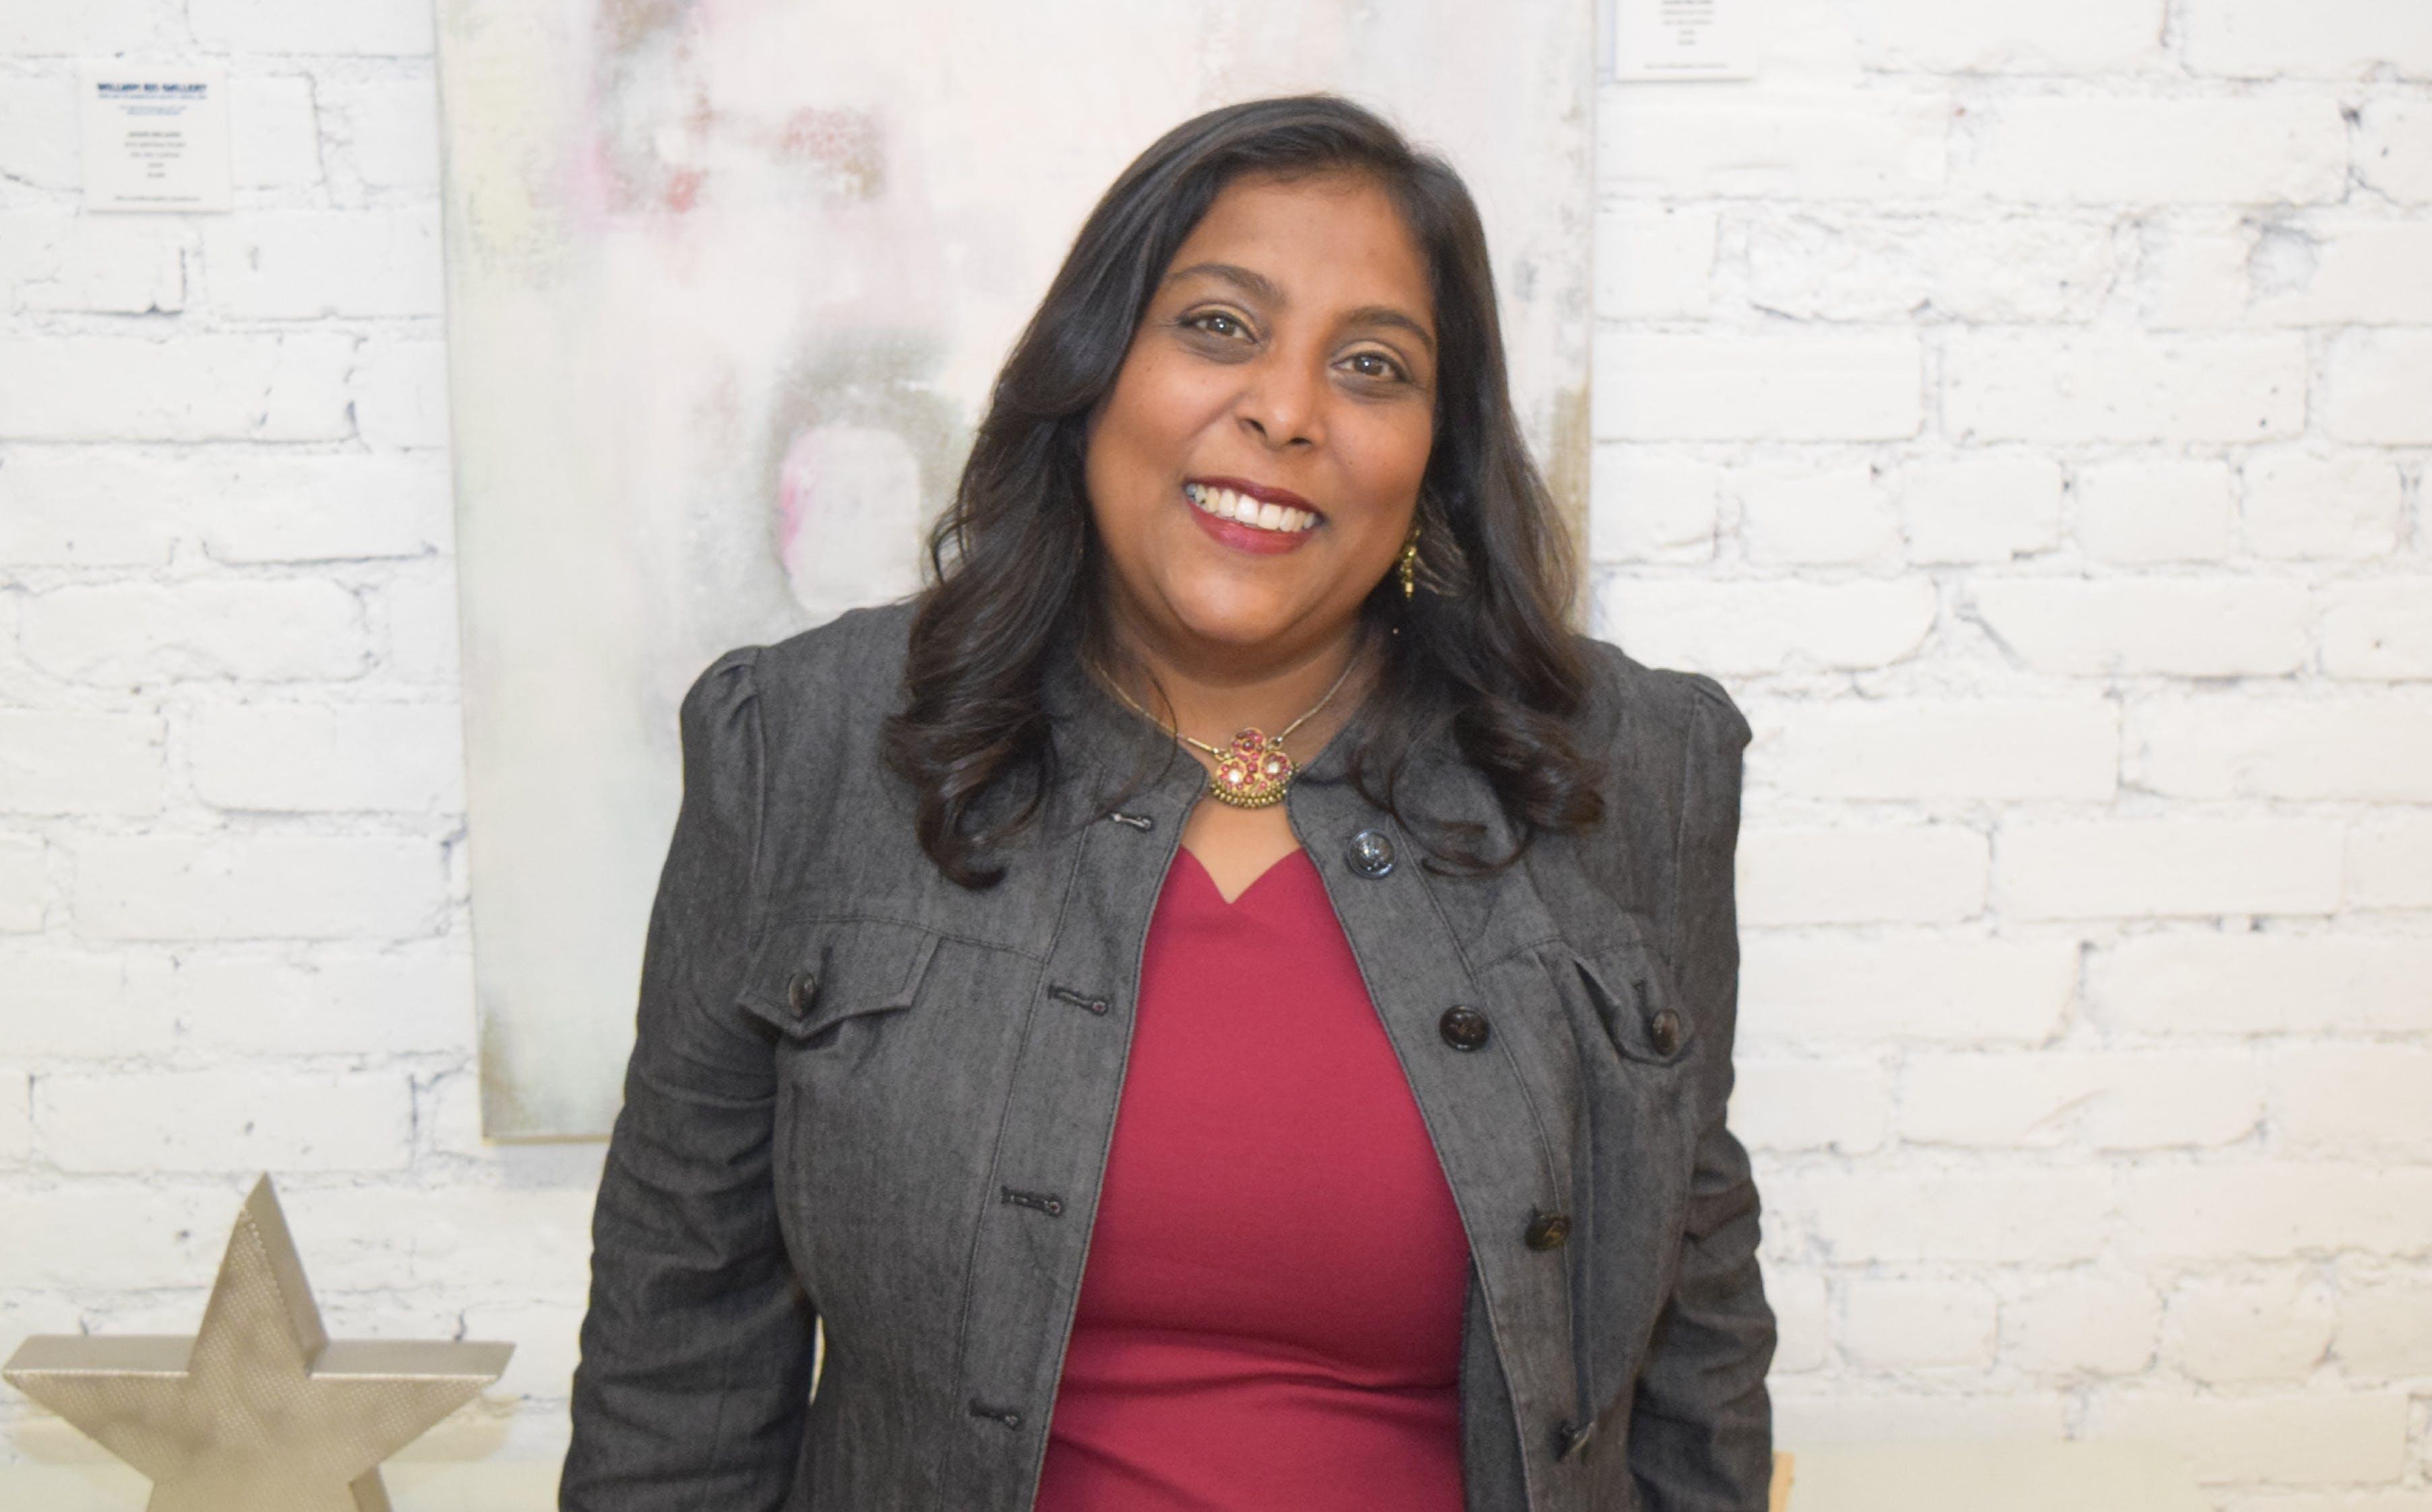 seema.com, seema woman, seema South Asian women leaders, seema network, seema newsletter, seema South Asian women leaders 2020, Surabhi Lal, luminary, chief impact officer, NYU adjunct professor, NYU professor